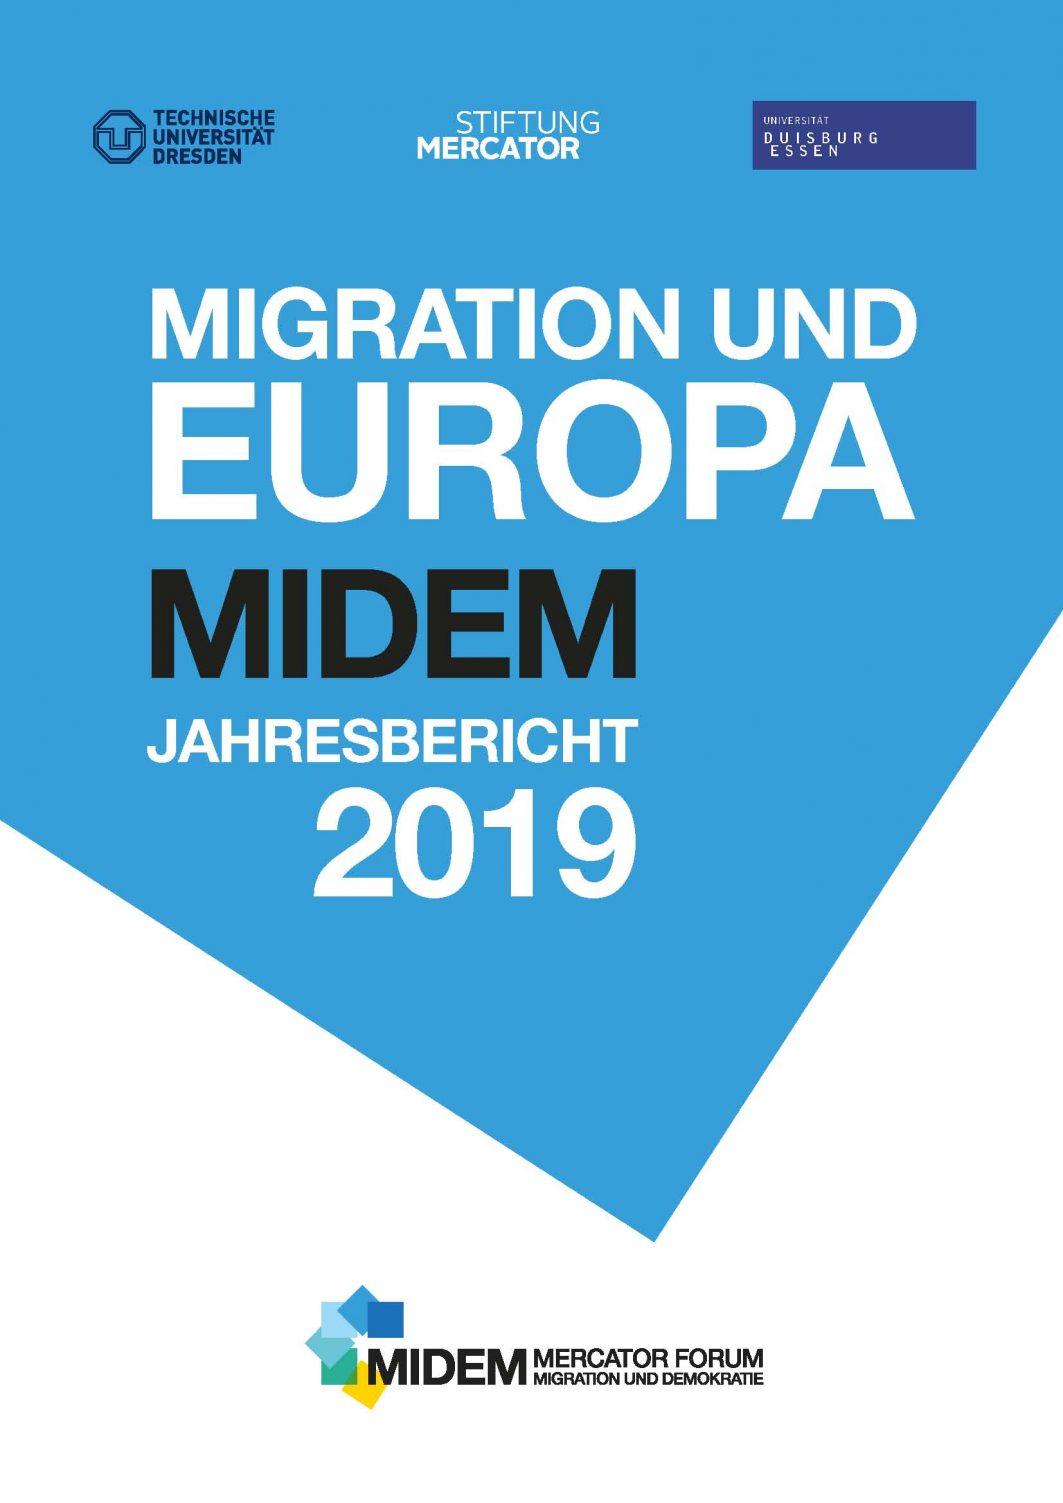 MIDEM Jahresbericht 2019